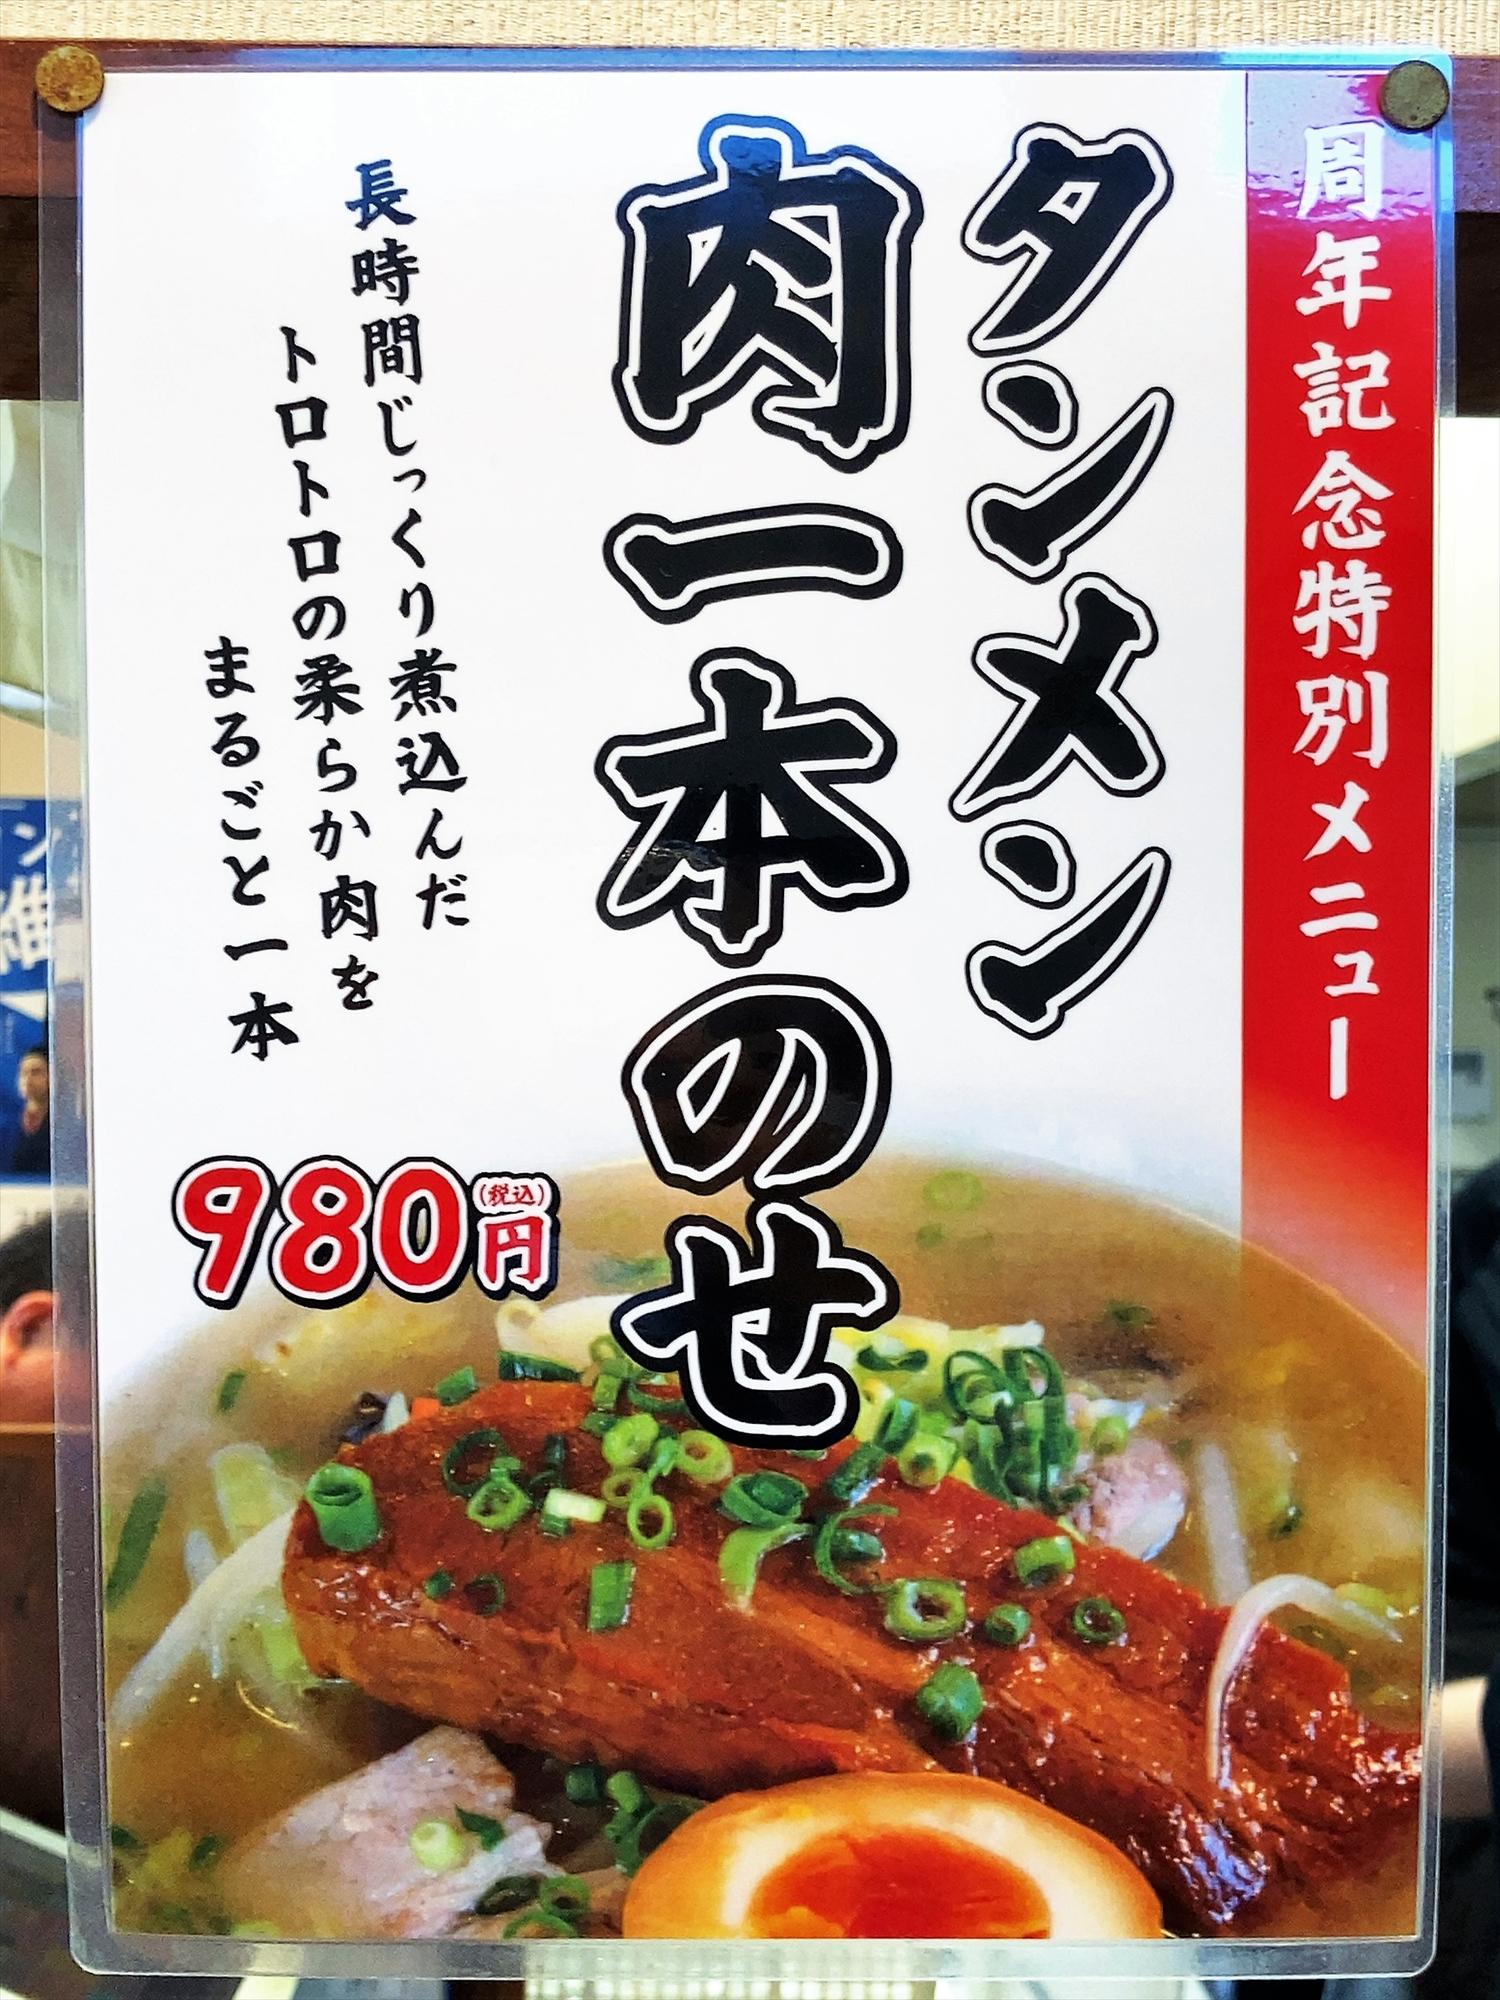 麺屋 田力の限定